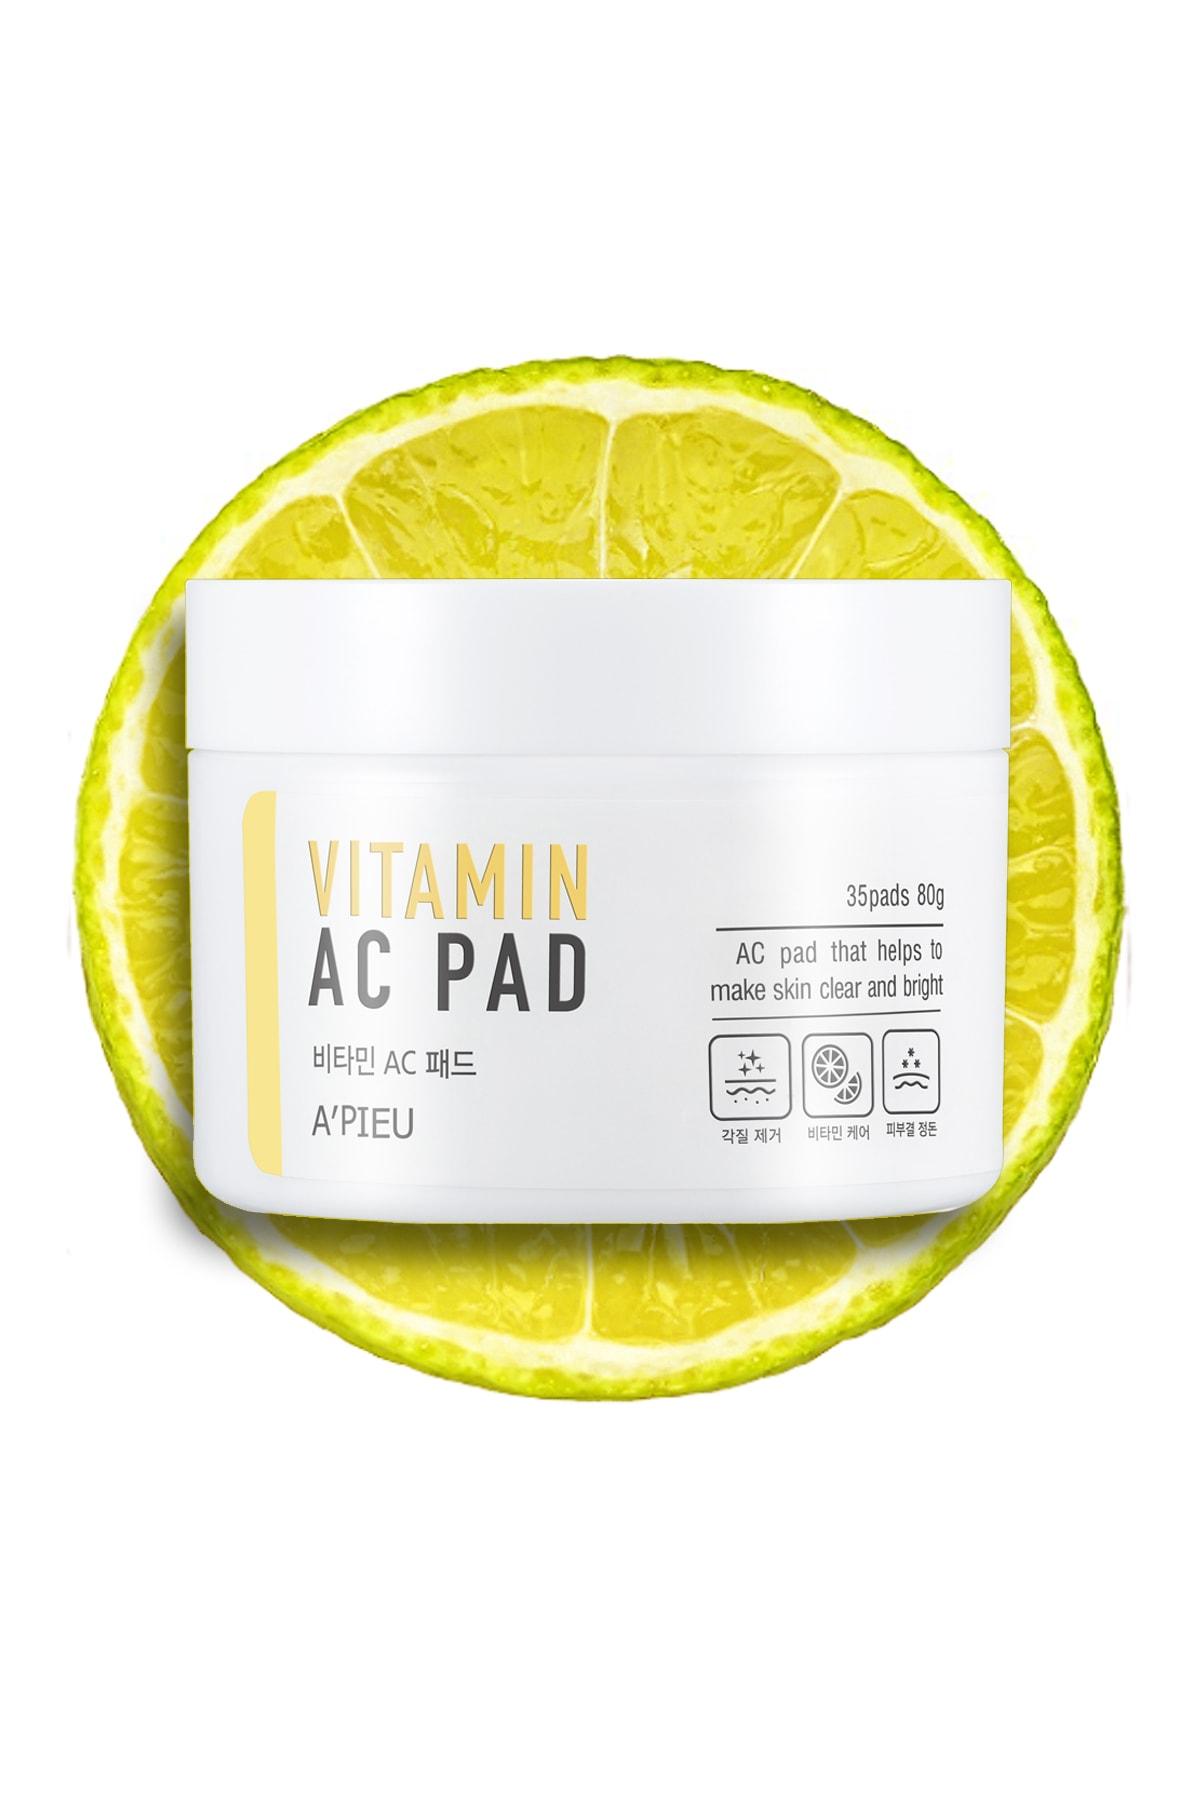 Missha Vitamin İçerikli Canlandırıcı Pürüzsüzleştirici Pamuk Ped (35ad) APIEU Vitamin AC Pad